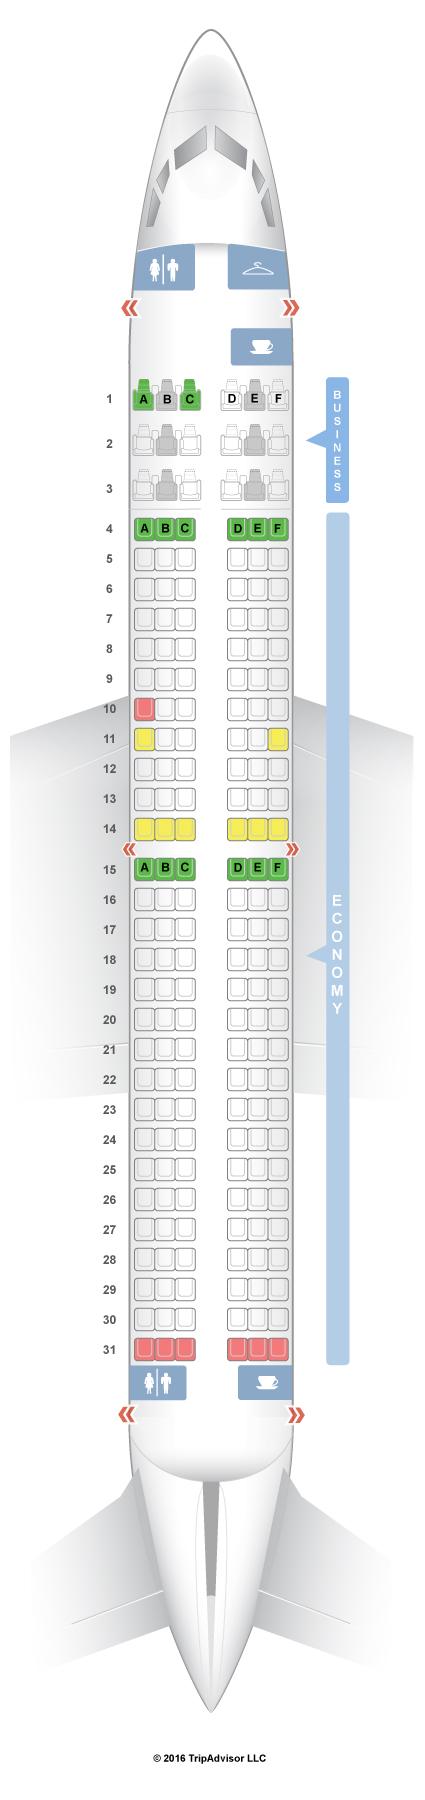 Boeing 737 Seat Plan Brokeasshome Com